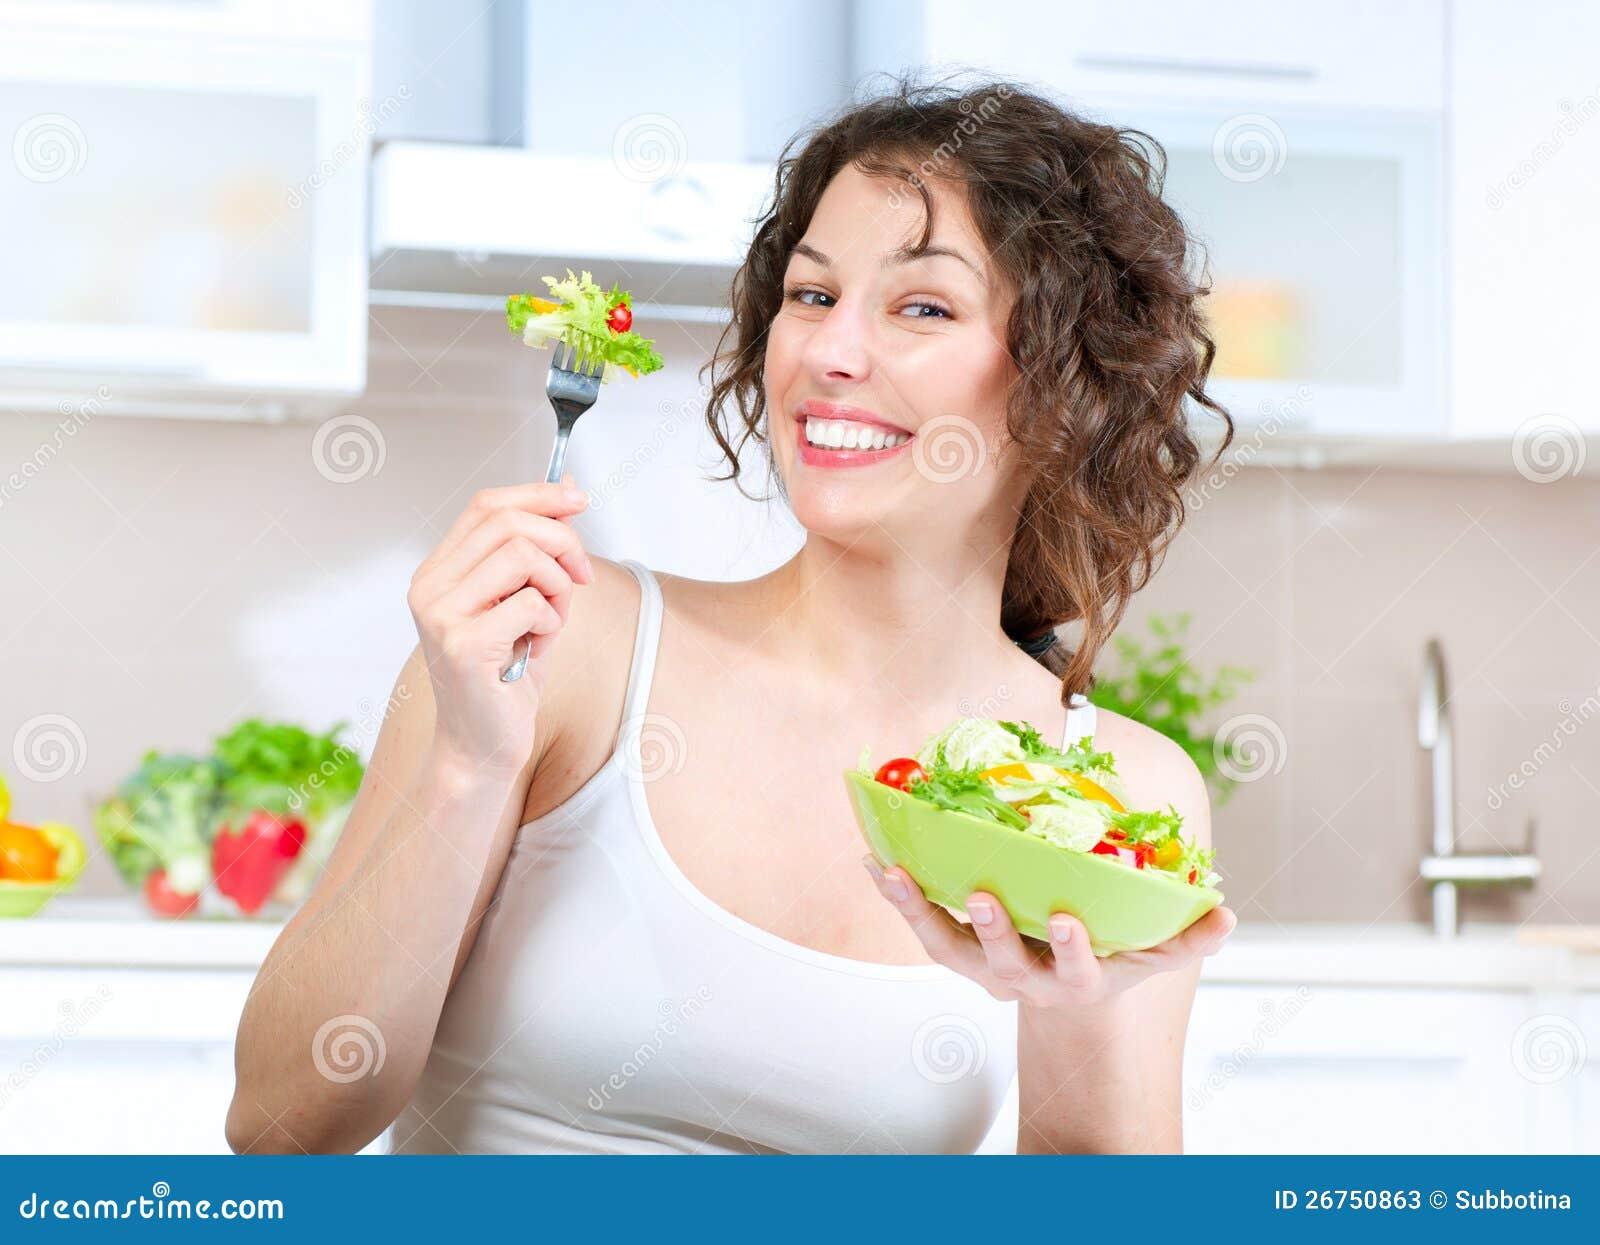 Dieta. Donna che mangia insalata di verdure